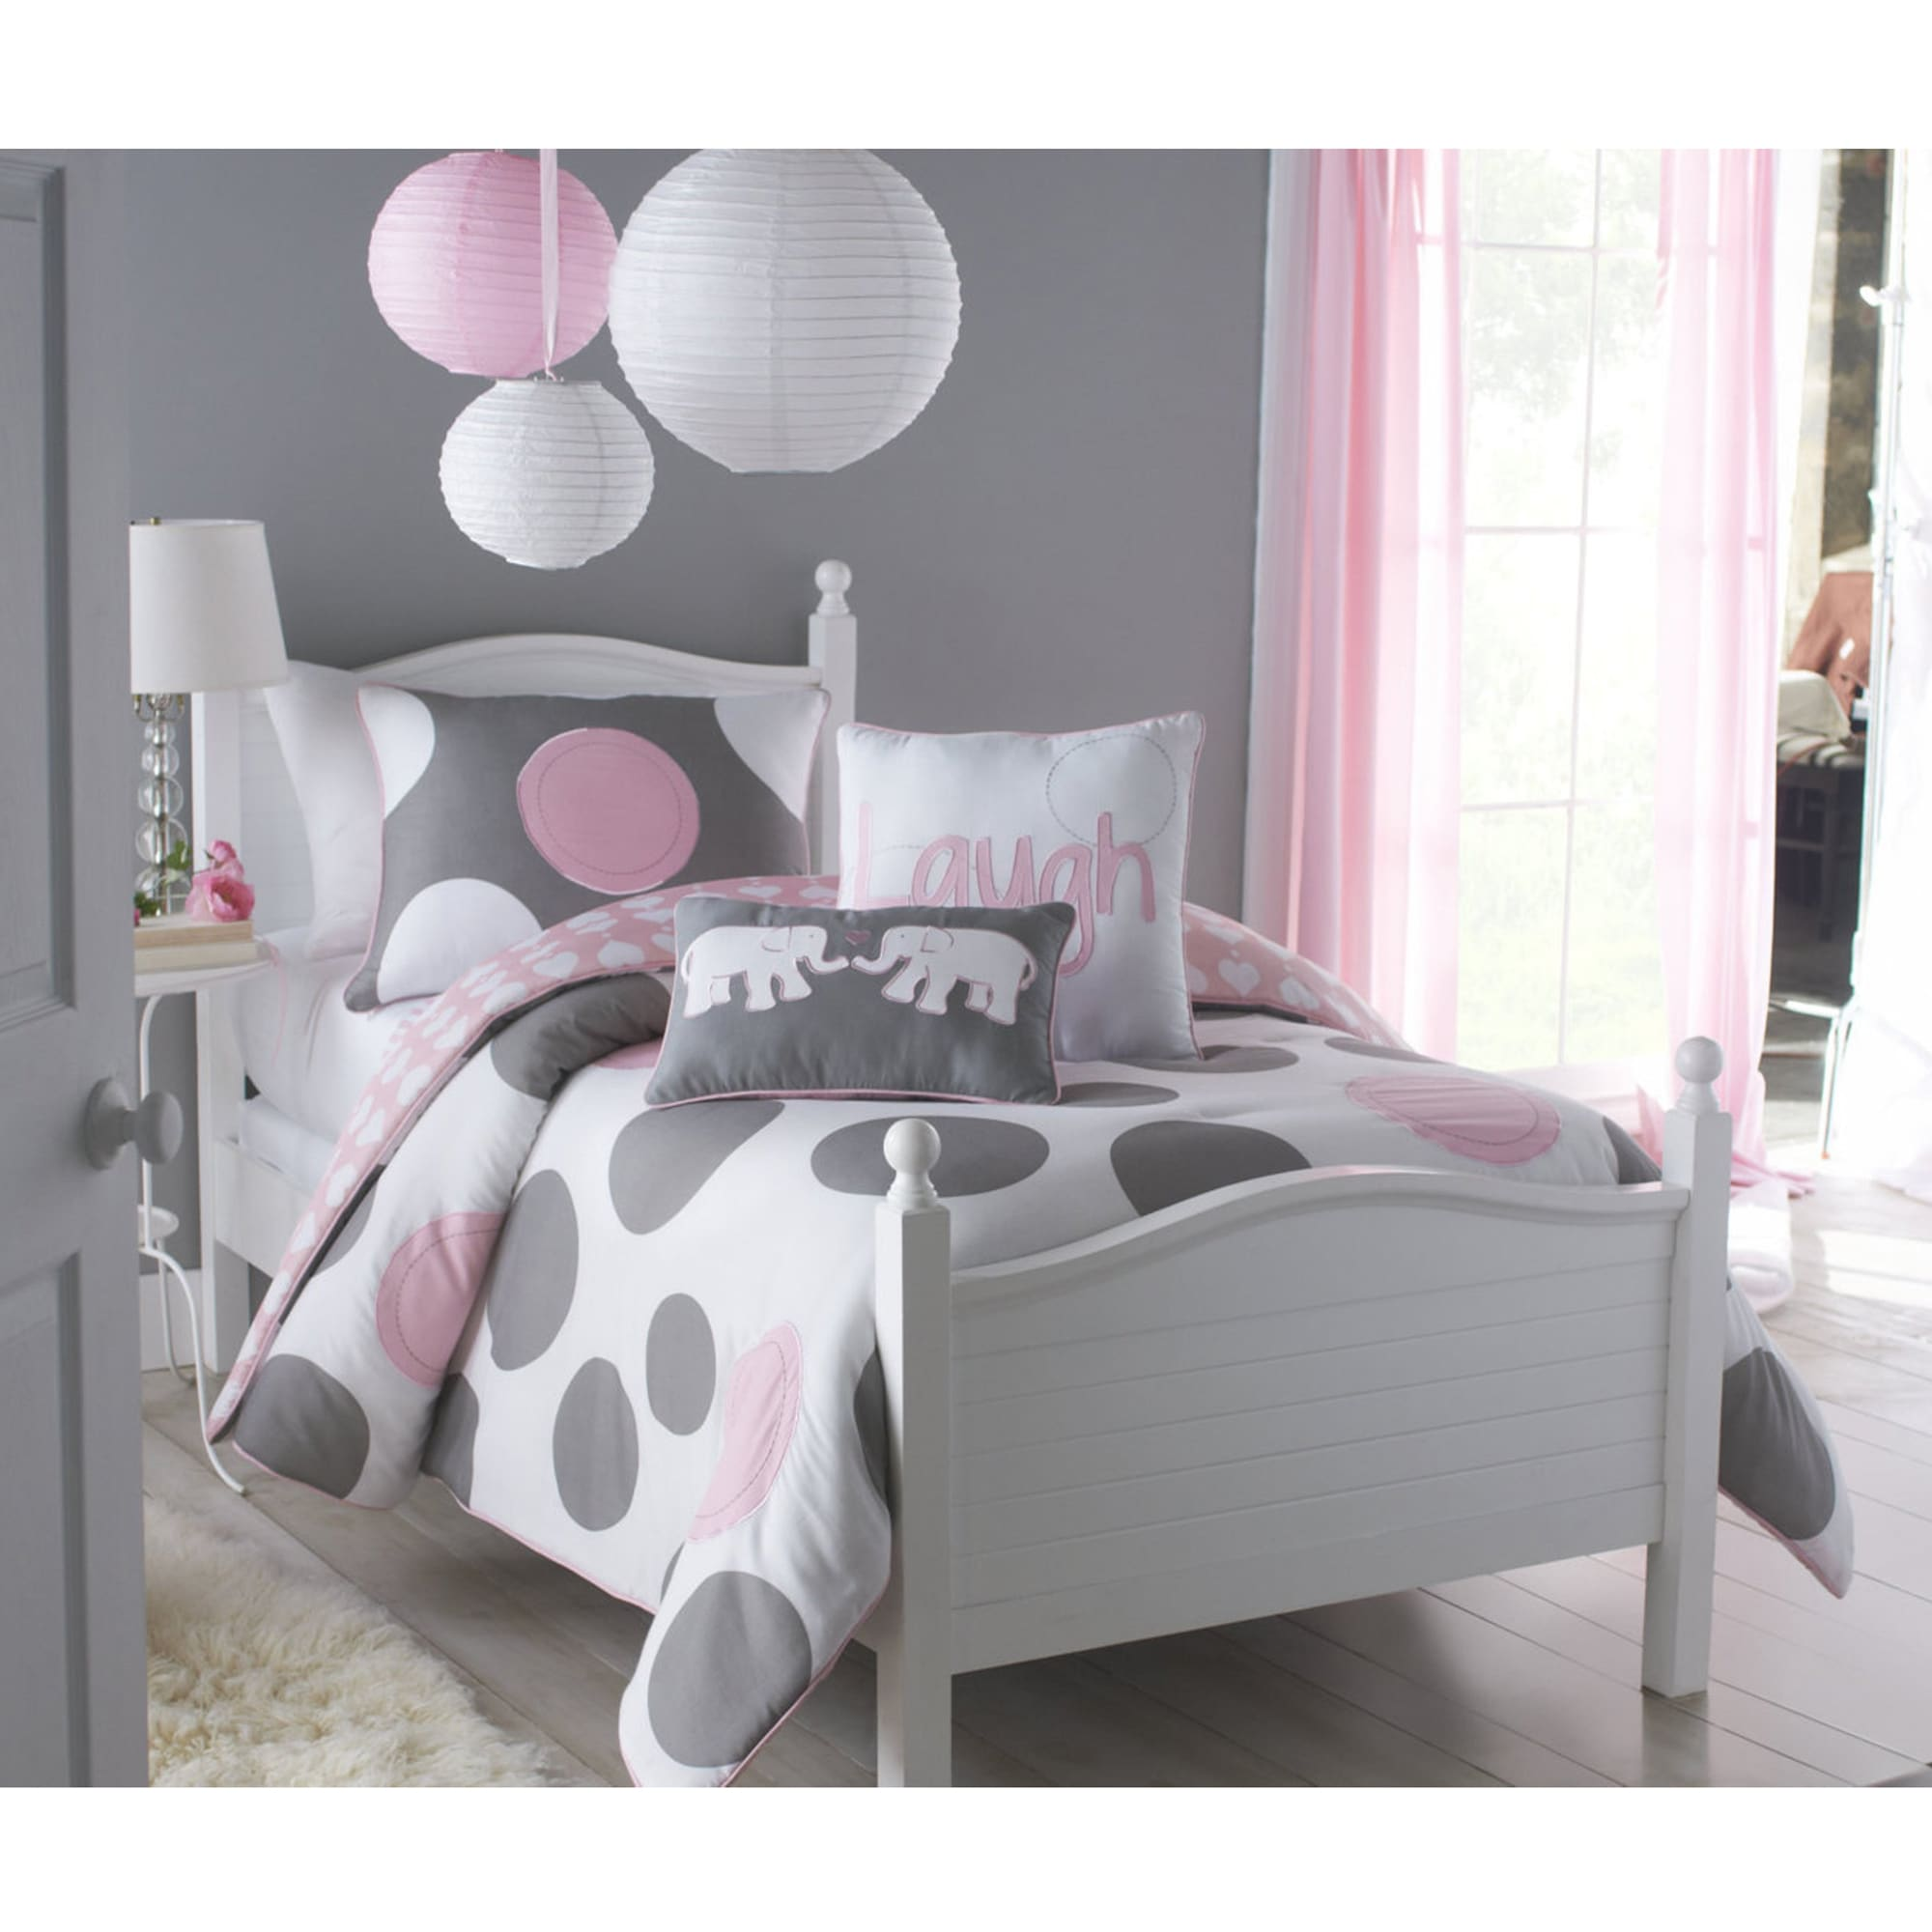 VCNY Big Believers Pink Parade Polka Dot 3-piece Comforter Set